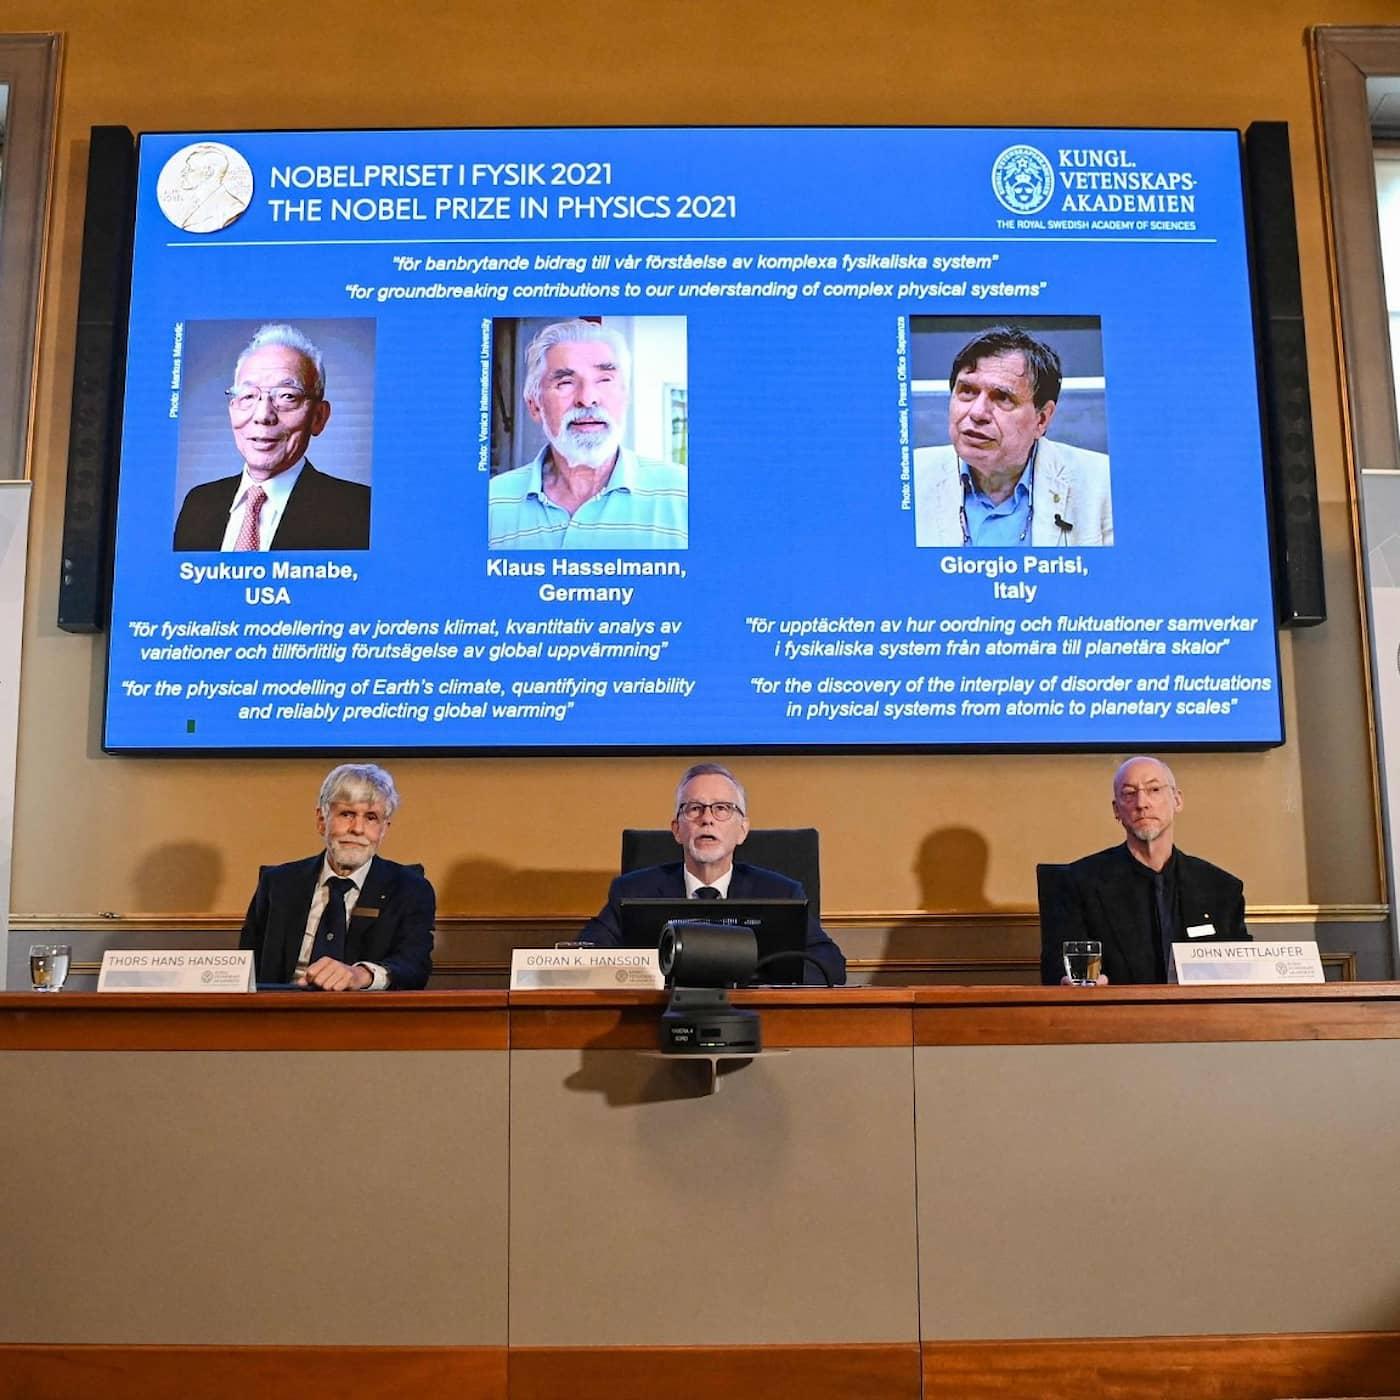 Klimatforskning får årets Nobelpris i fysik